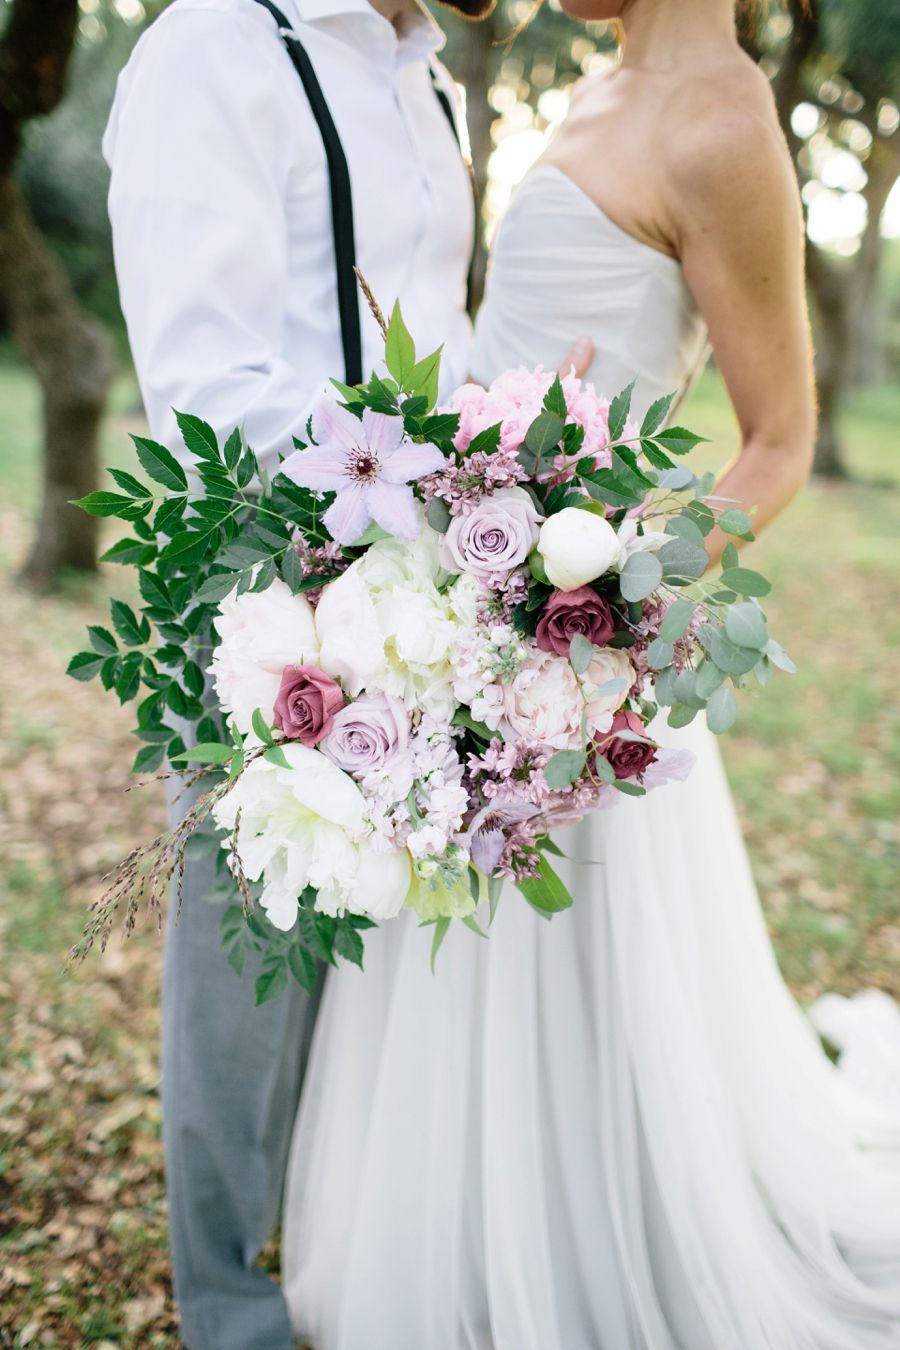 Lavender decor for wedding Romantic Lavender and Gray Wedding Ideas  Grey weddings Romantic